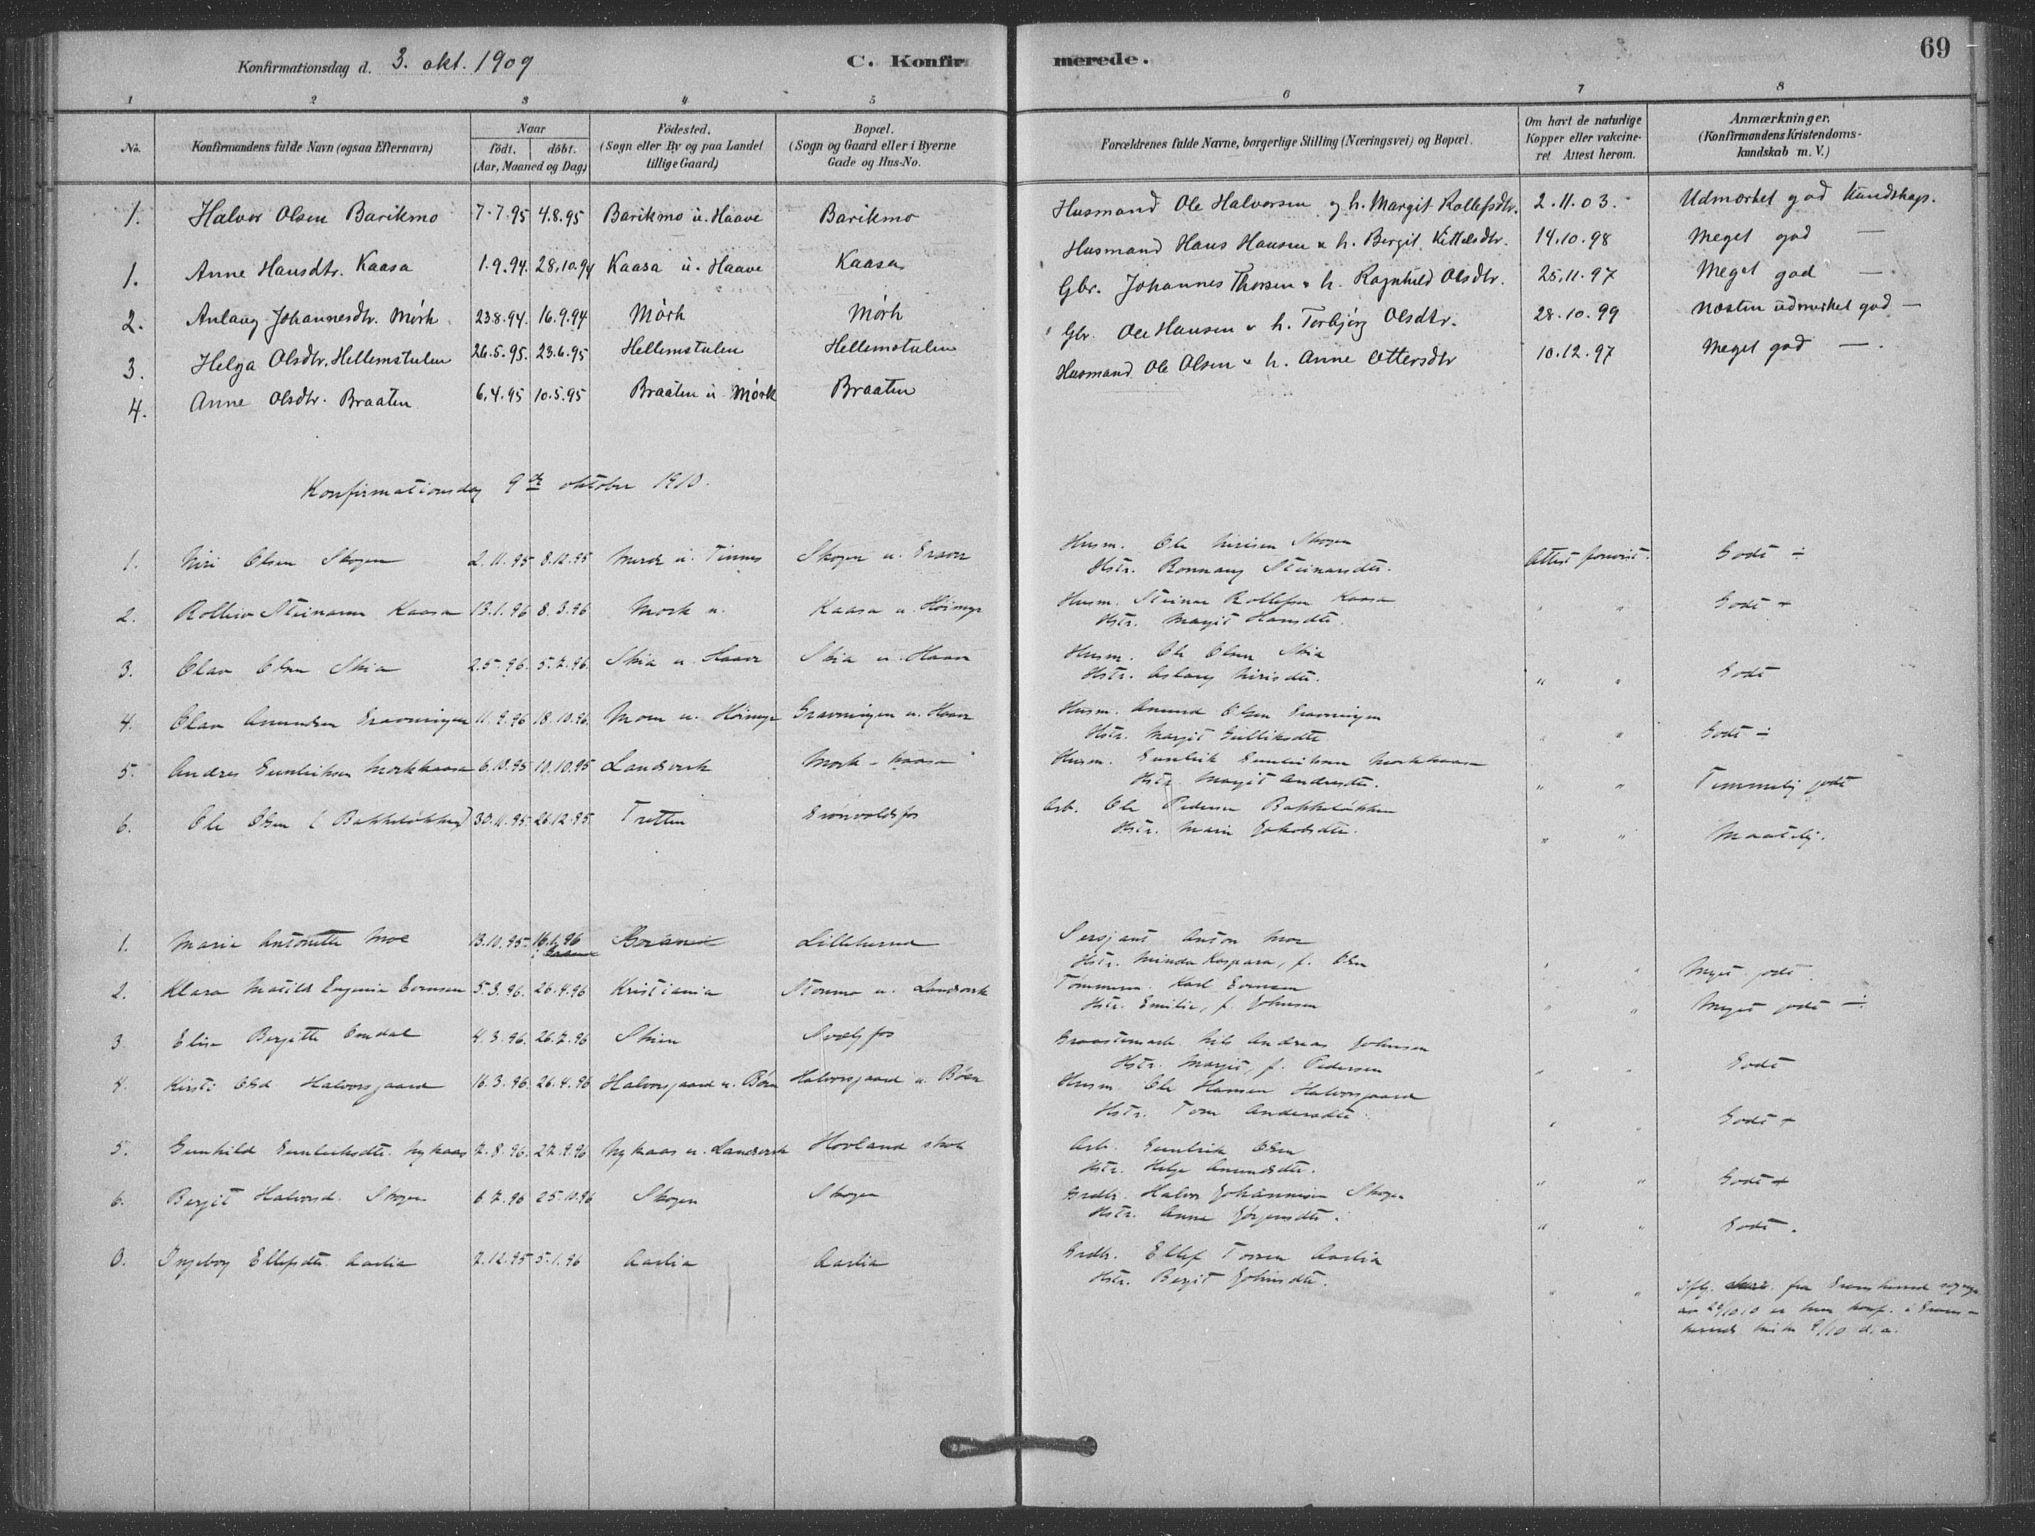 SAKO, Heddal kirkebøker, F/Fb/L0002: Ministerialbok nr. II 2, 1878-1913, s. 69